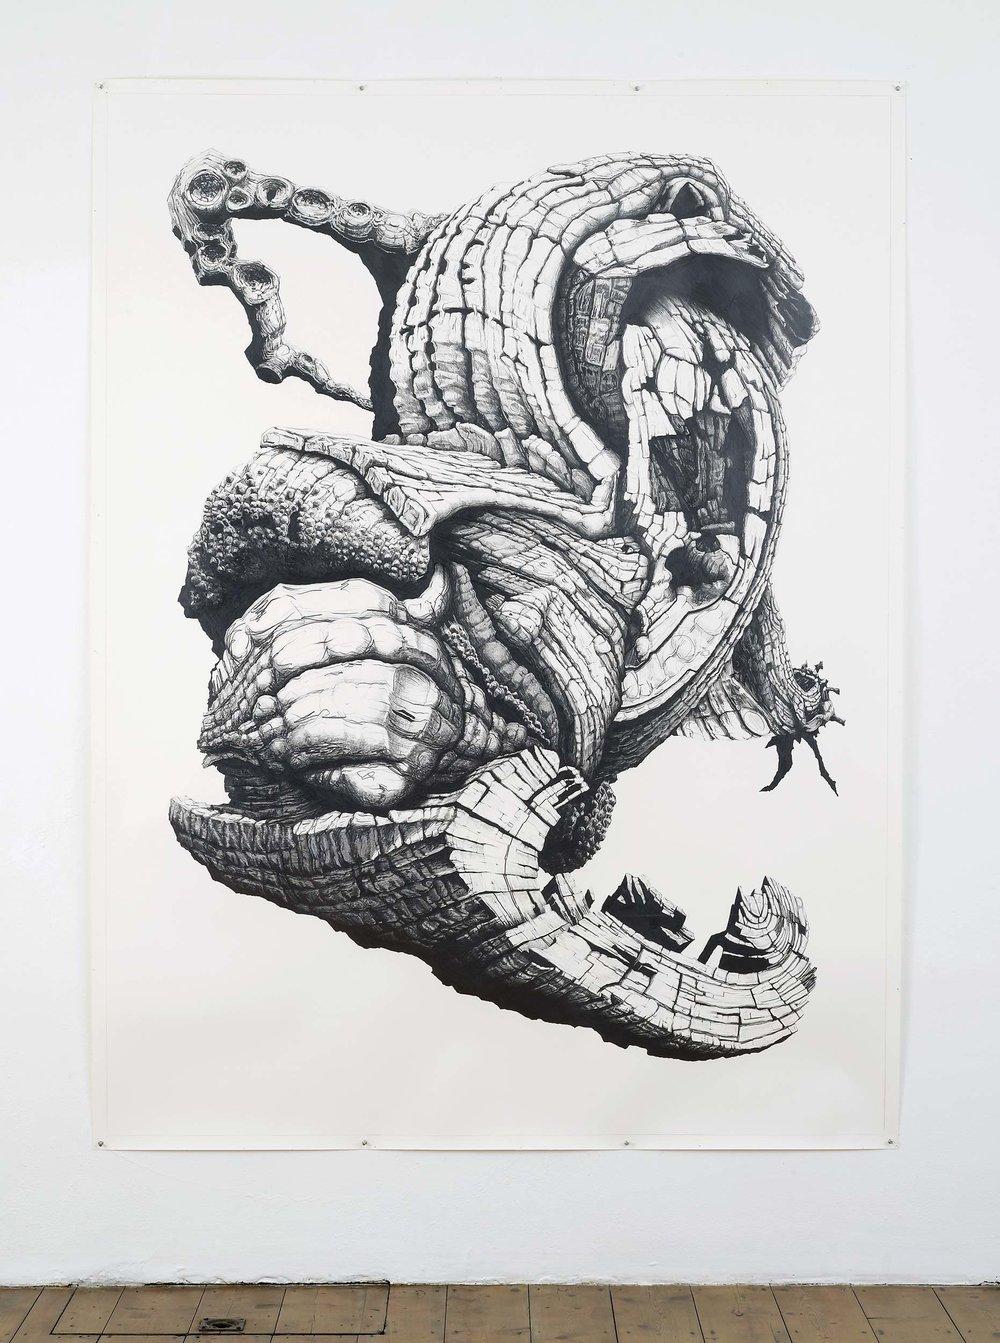 Starling,-Pencil-on-paper,-220-x-165cm,-2012-(in-situ).jpg